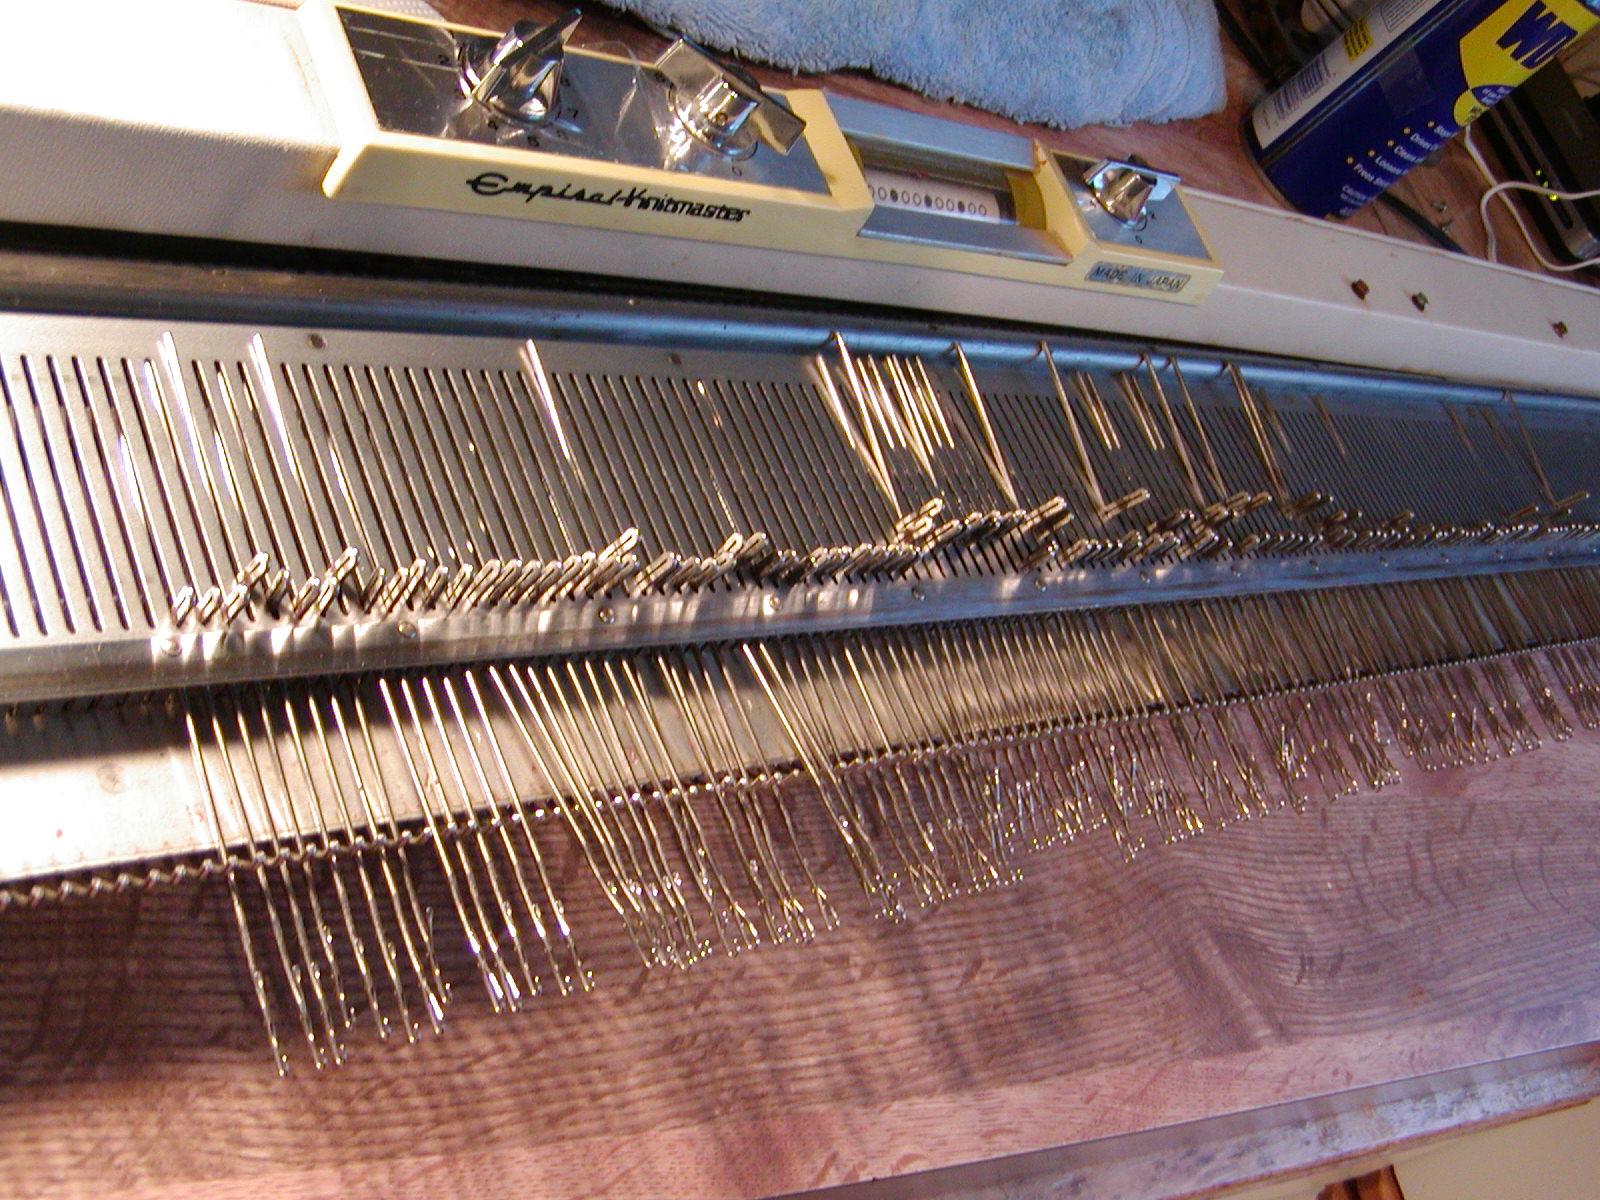 Addicted to Machine Knitting: Empisal Knitmaster 305